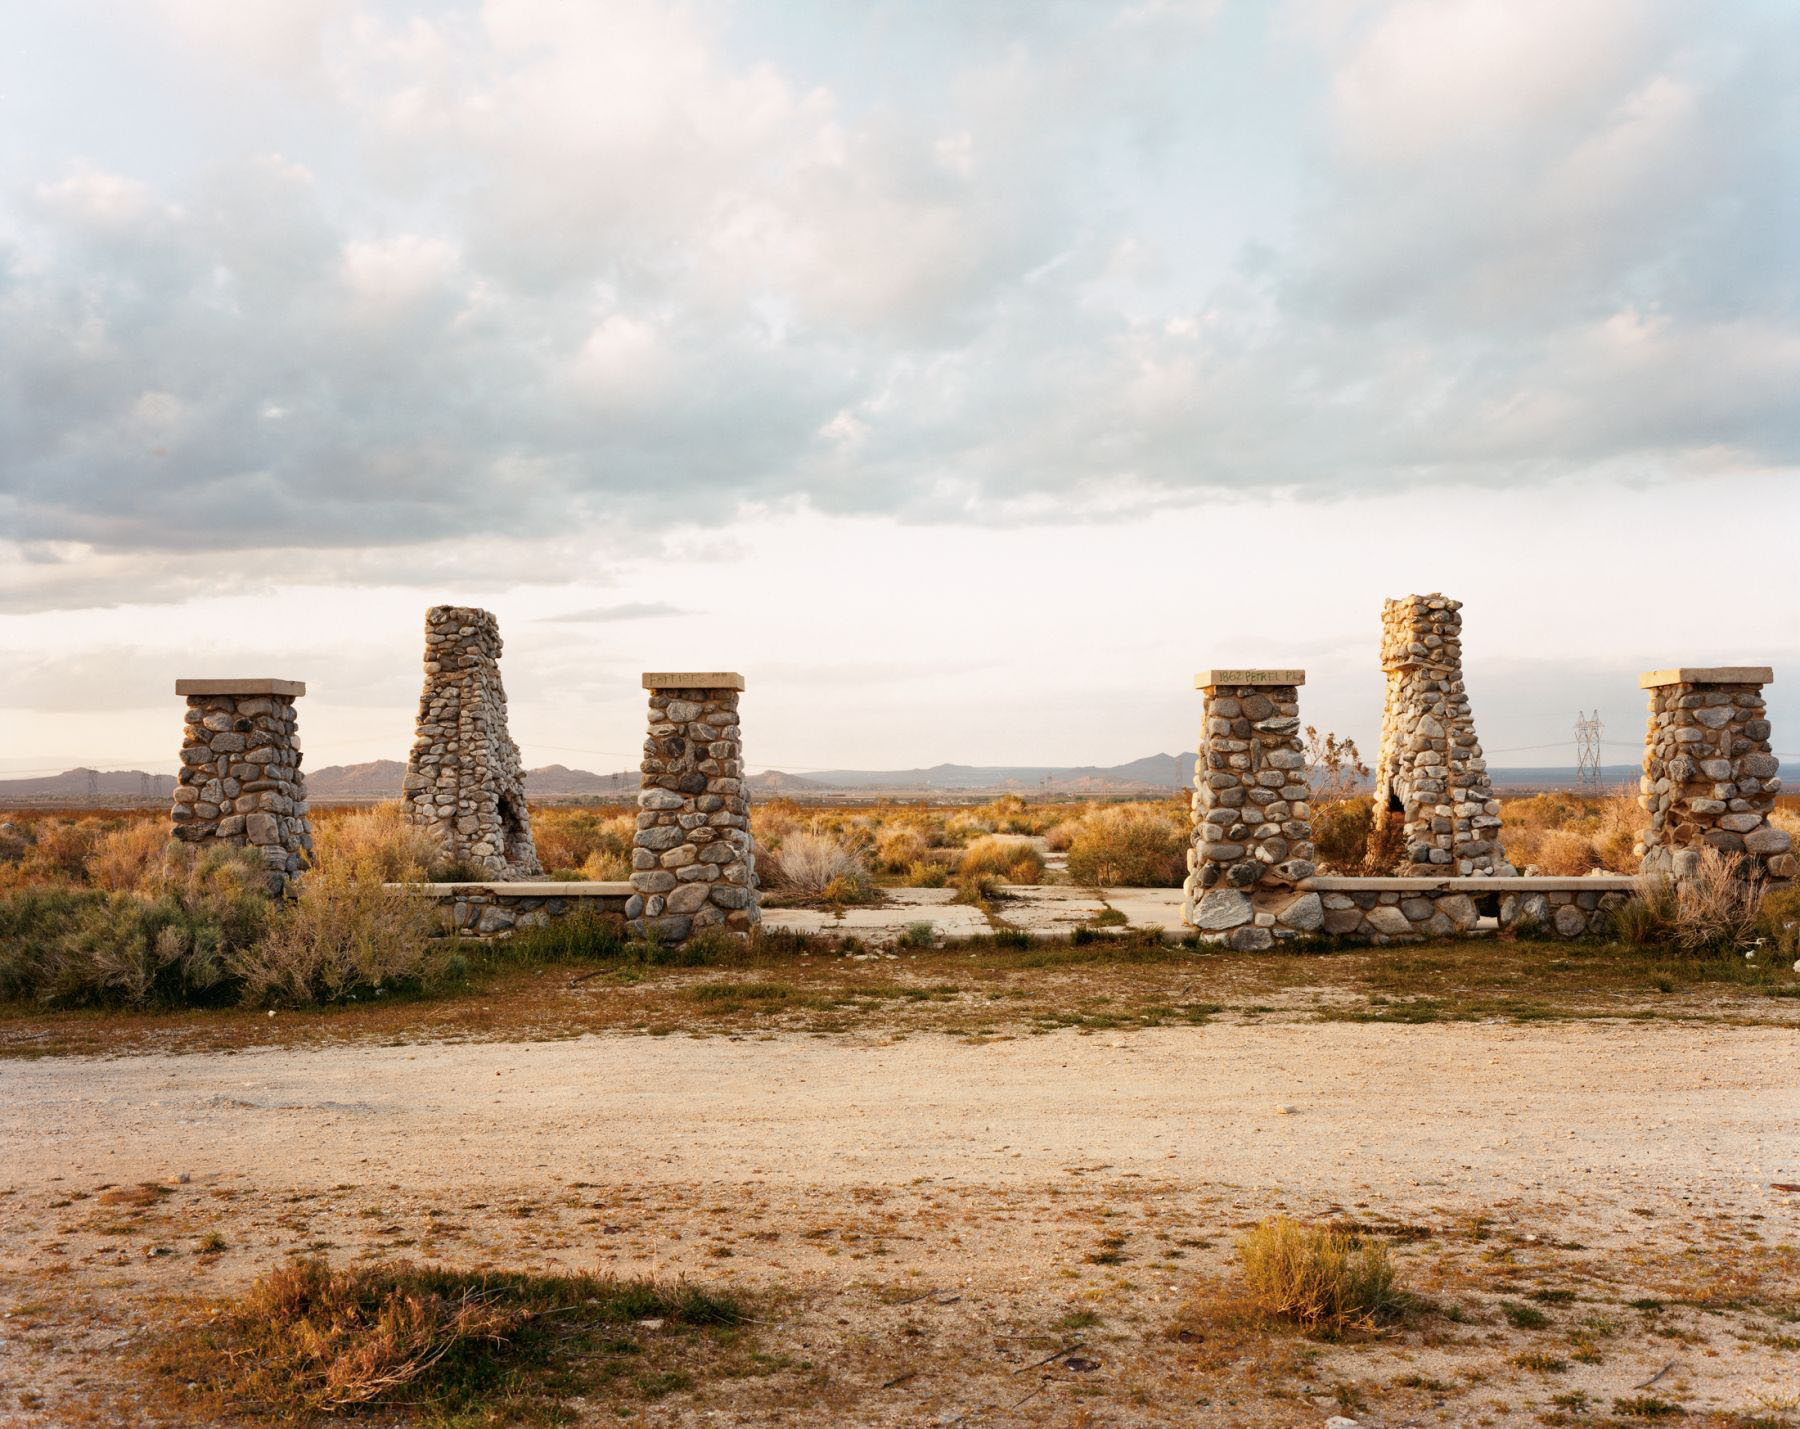 Ruins of the General Assembly Hall and Hotel, Llano del Rio, Antelope Valley, California, November 1993